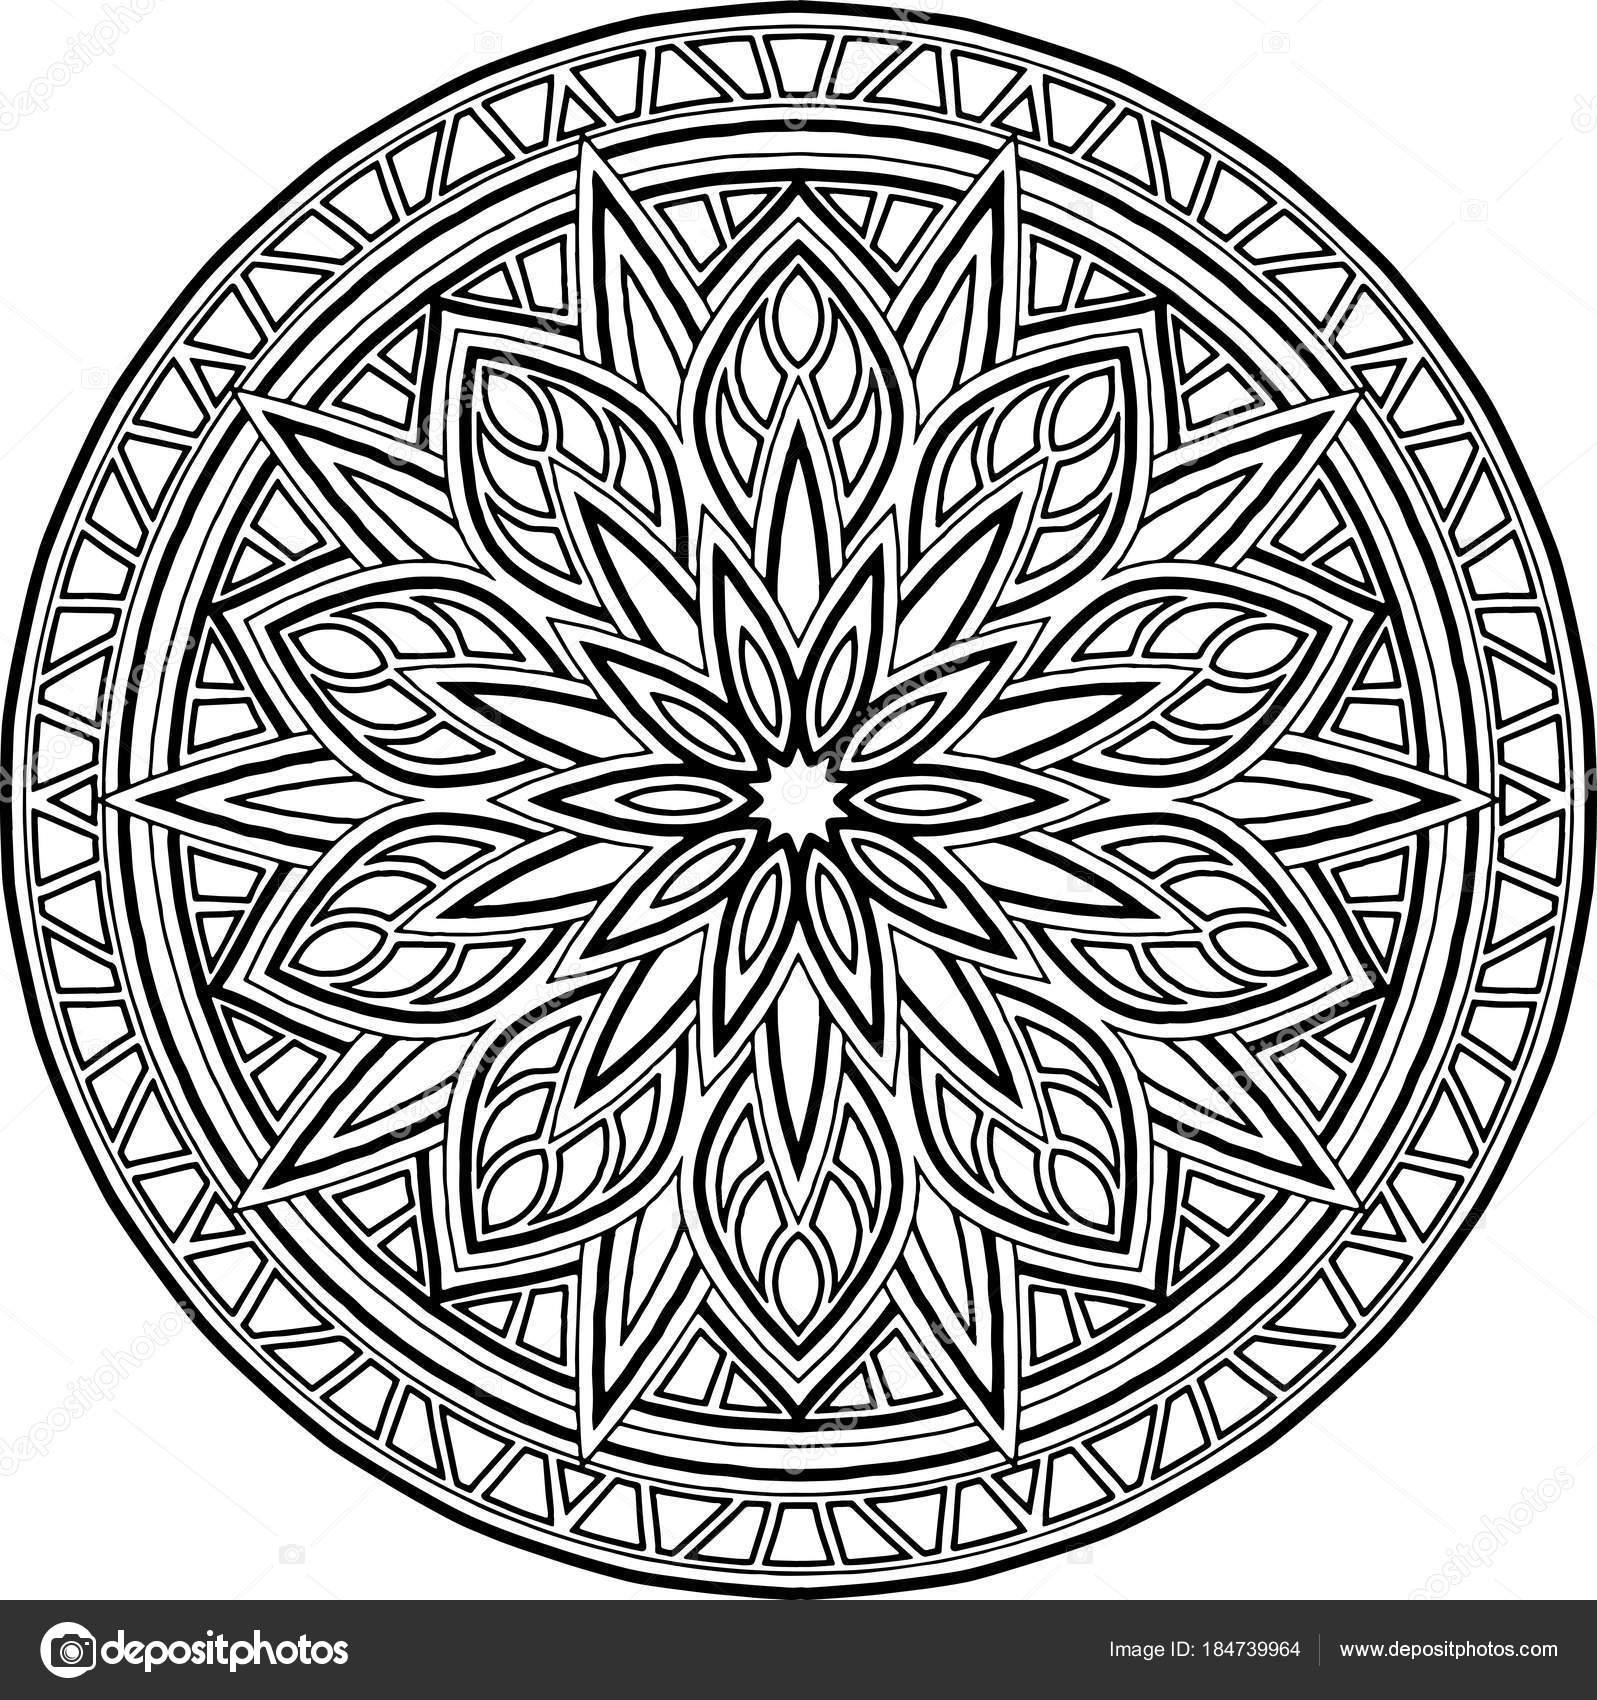 Abbildung Mandala zum Ausmalen — Stockvektor © TAMSAMTAM #184739964